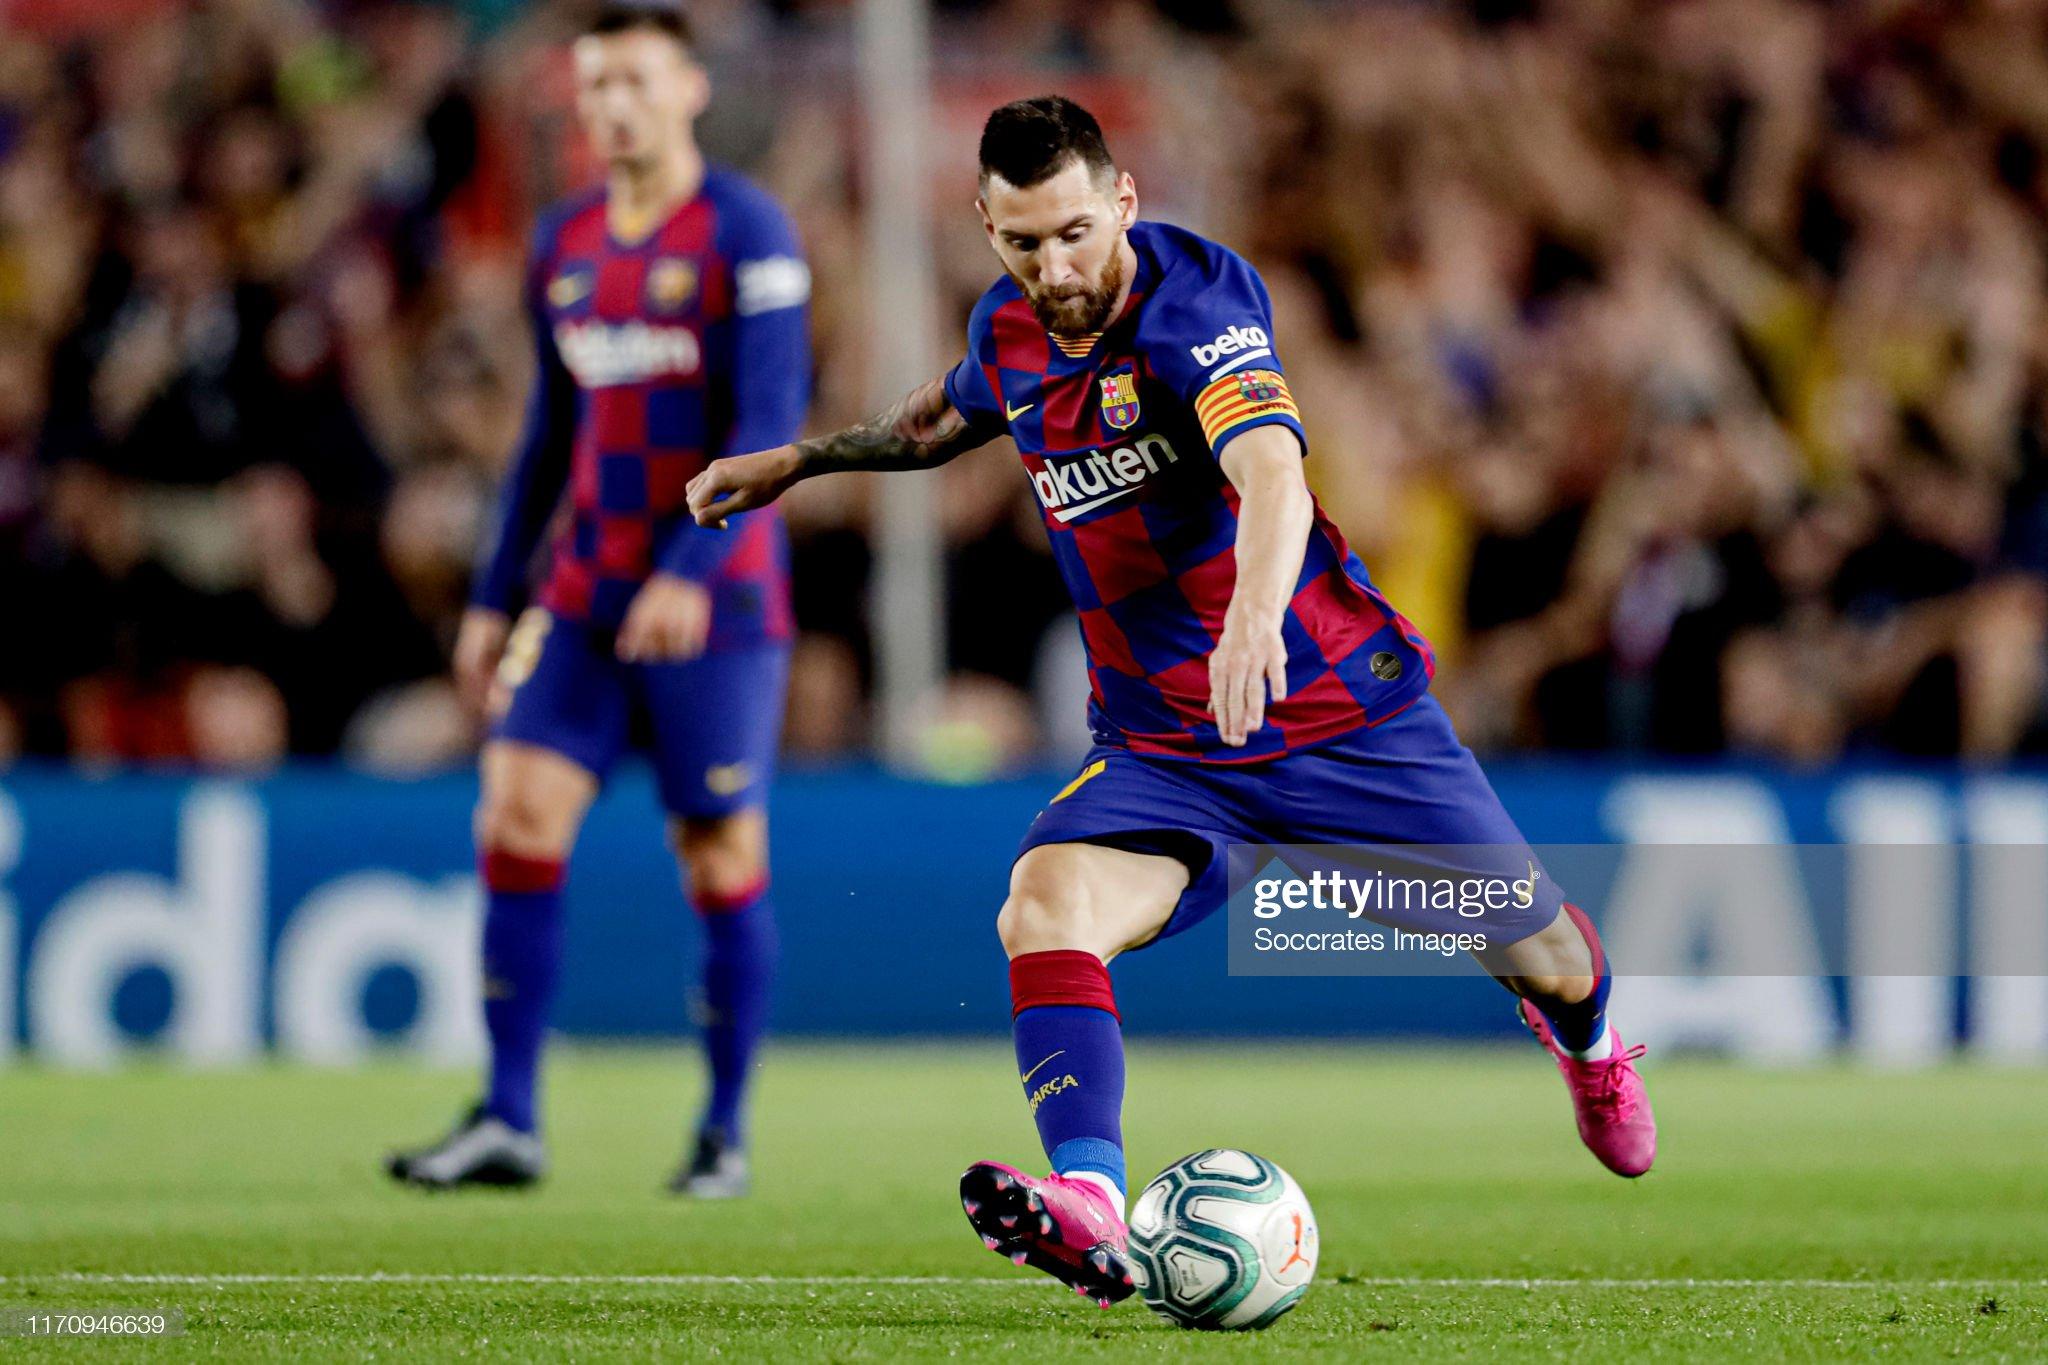 صور مباراة : برشلونة - فياريال 2-1 ( 24-09-2019 )  Lionel-messi-of-fc-barcelona-during-the-la-liga-santander-match-fc-picture-id1170946639?s=2048x2048